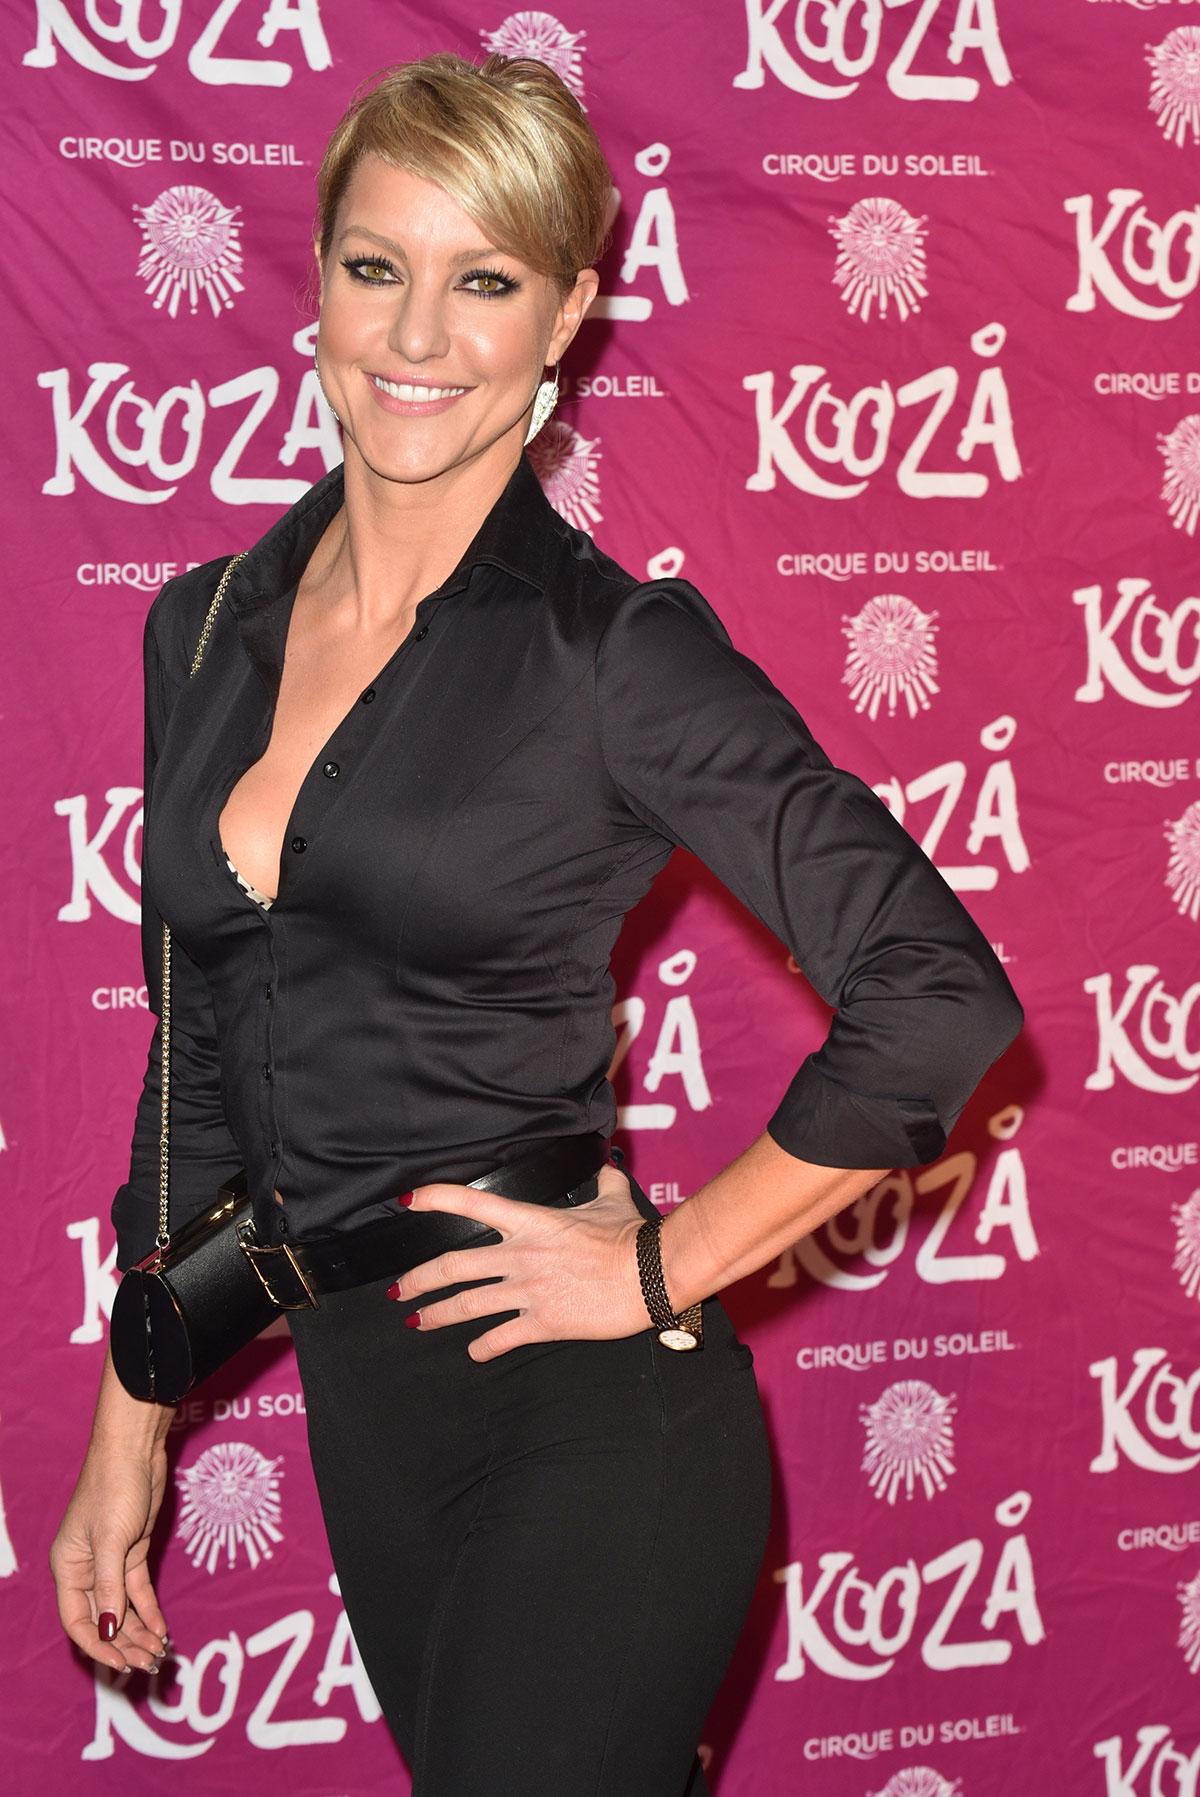 NATALIE LOWE At Kooza By Cirque Du Soleil VIP Performance